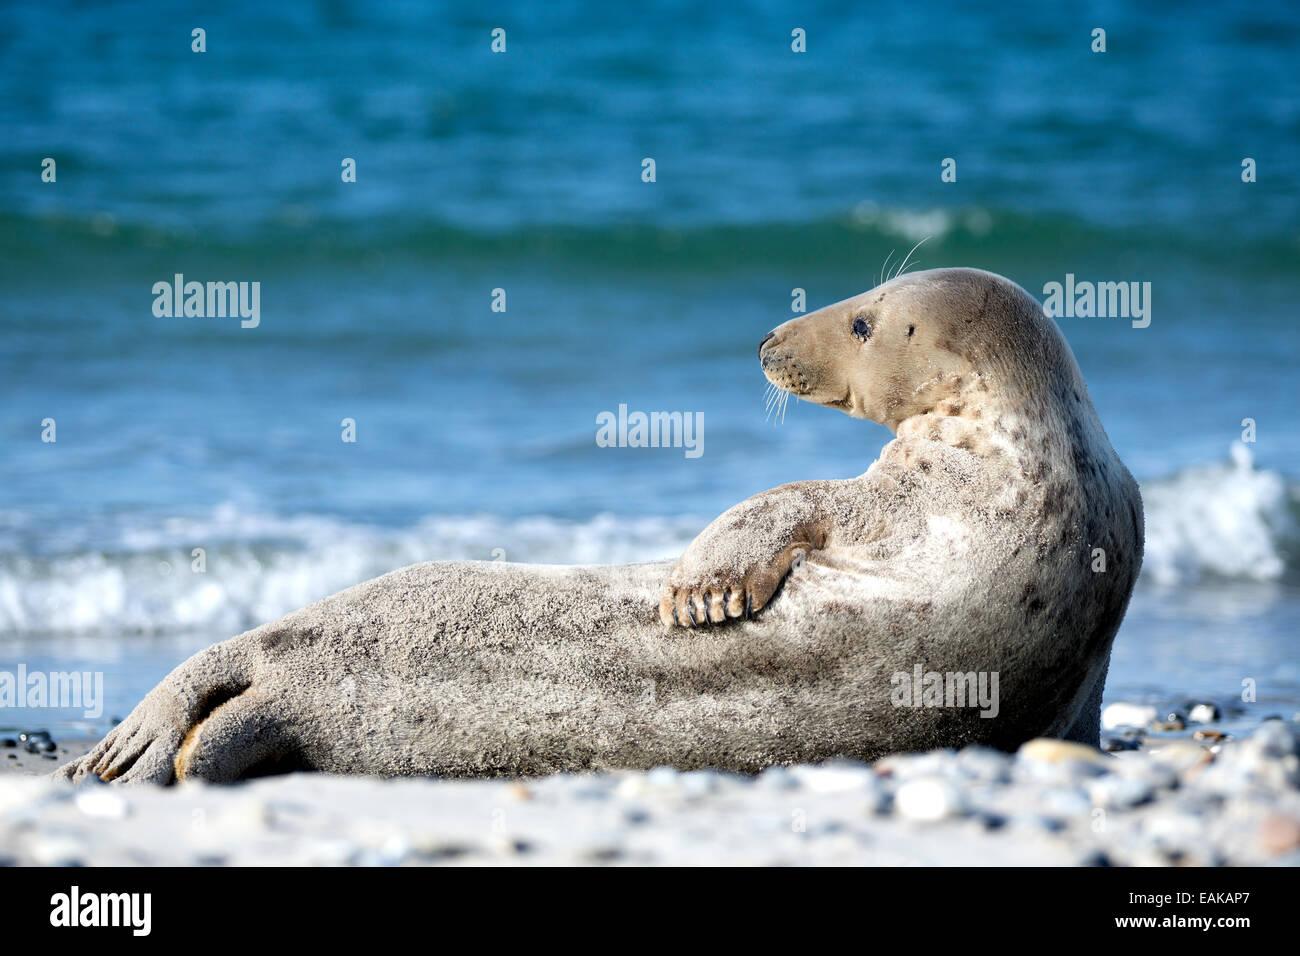 Grey Seal (Halichoerus grypus) on the beach, Heligoland, Schleswig-Holstein, Germany Stock Photo